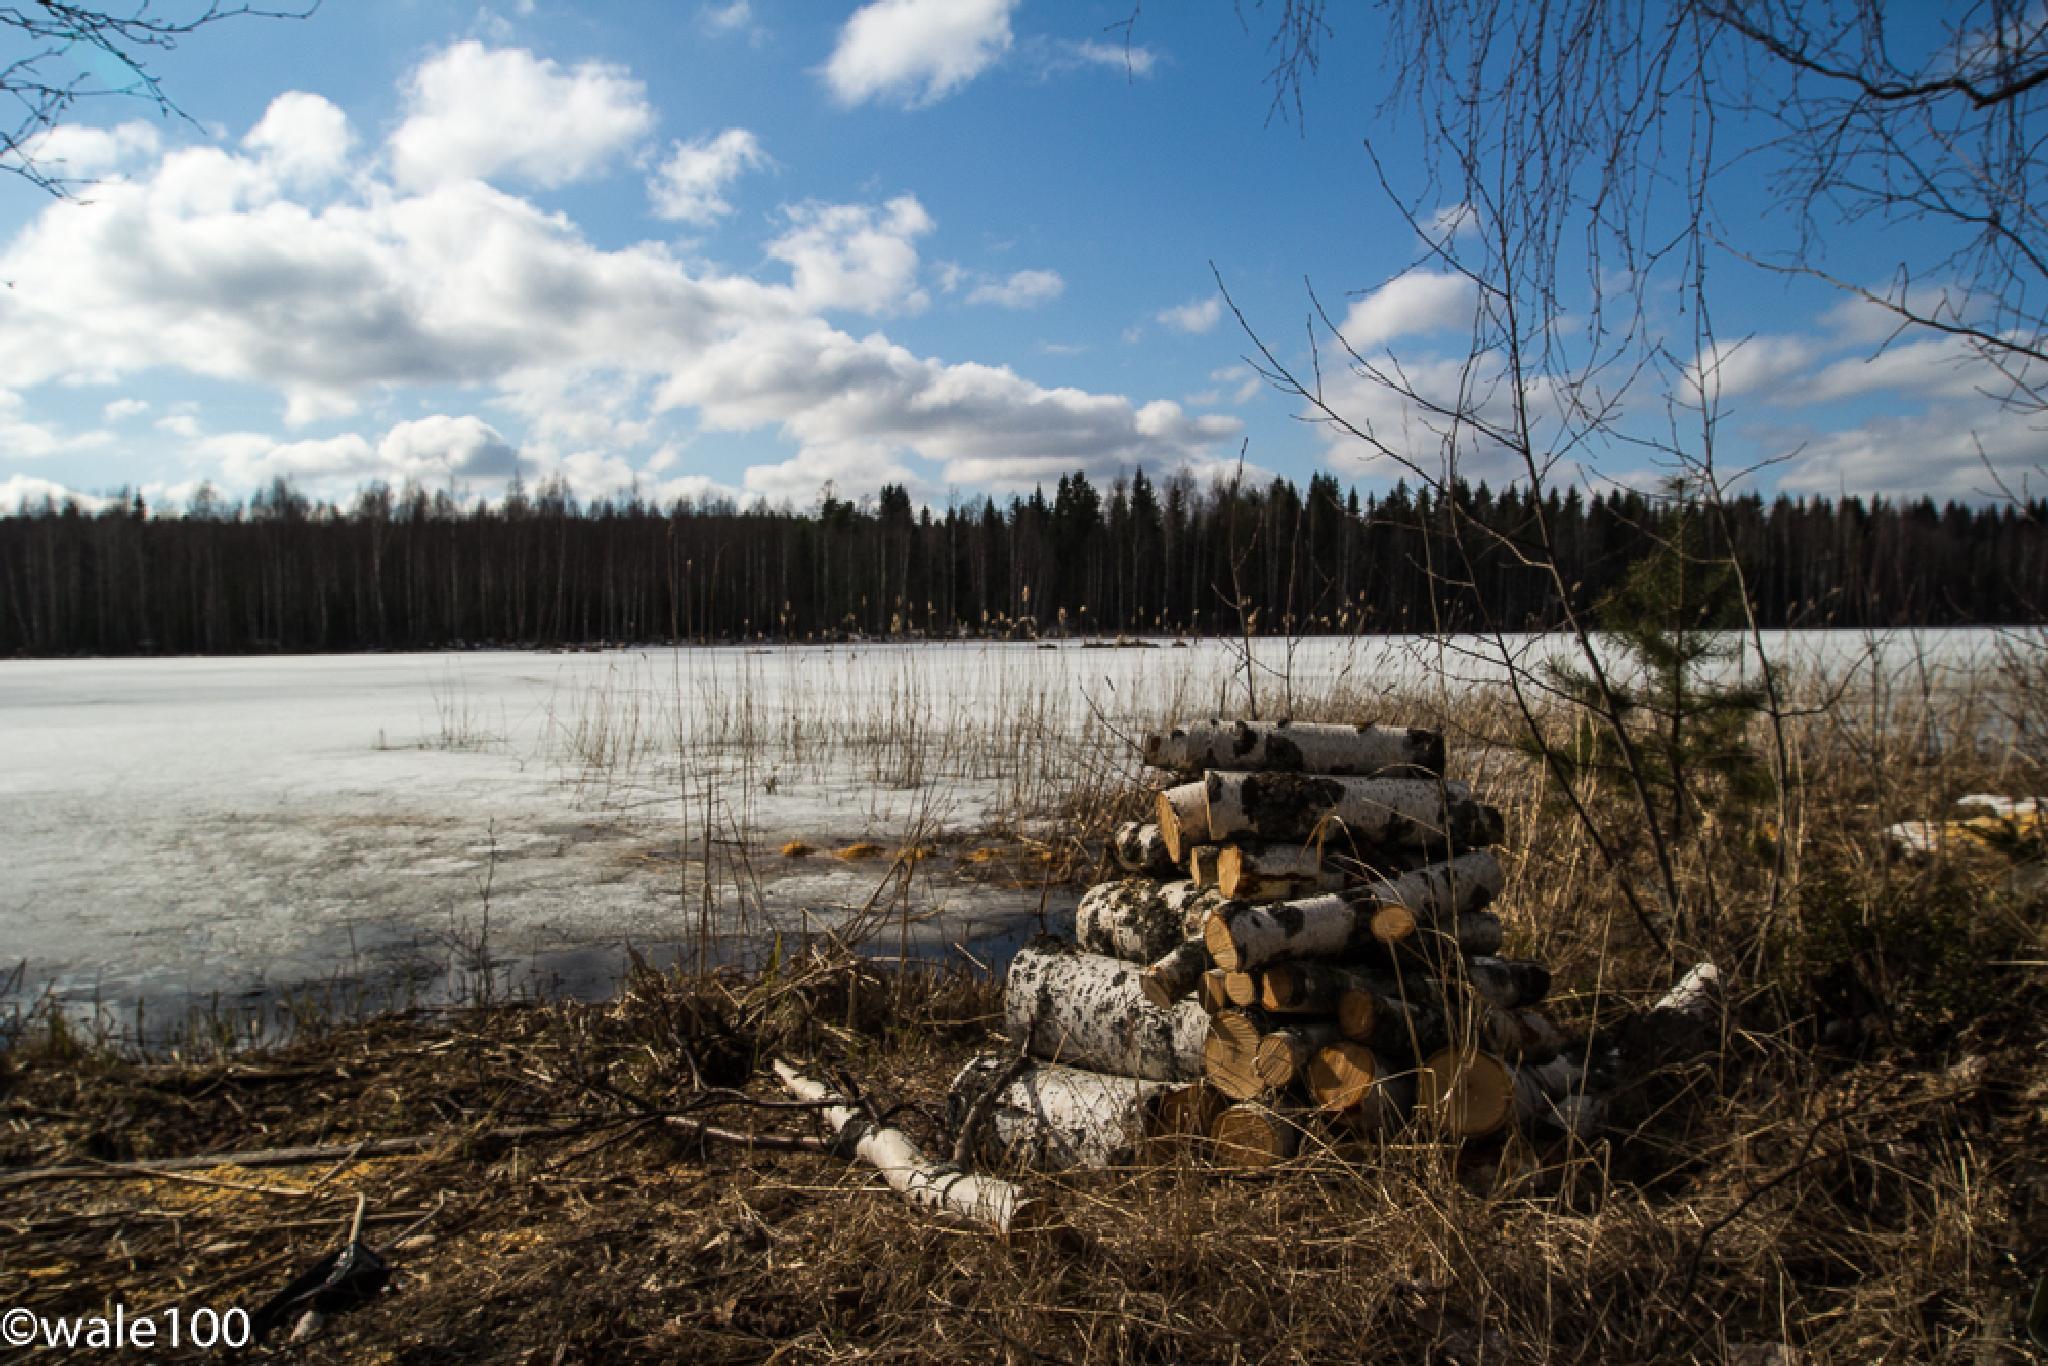 Logs by a frozen lake by wale